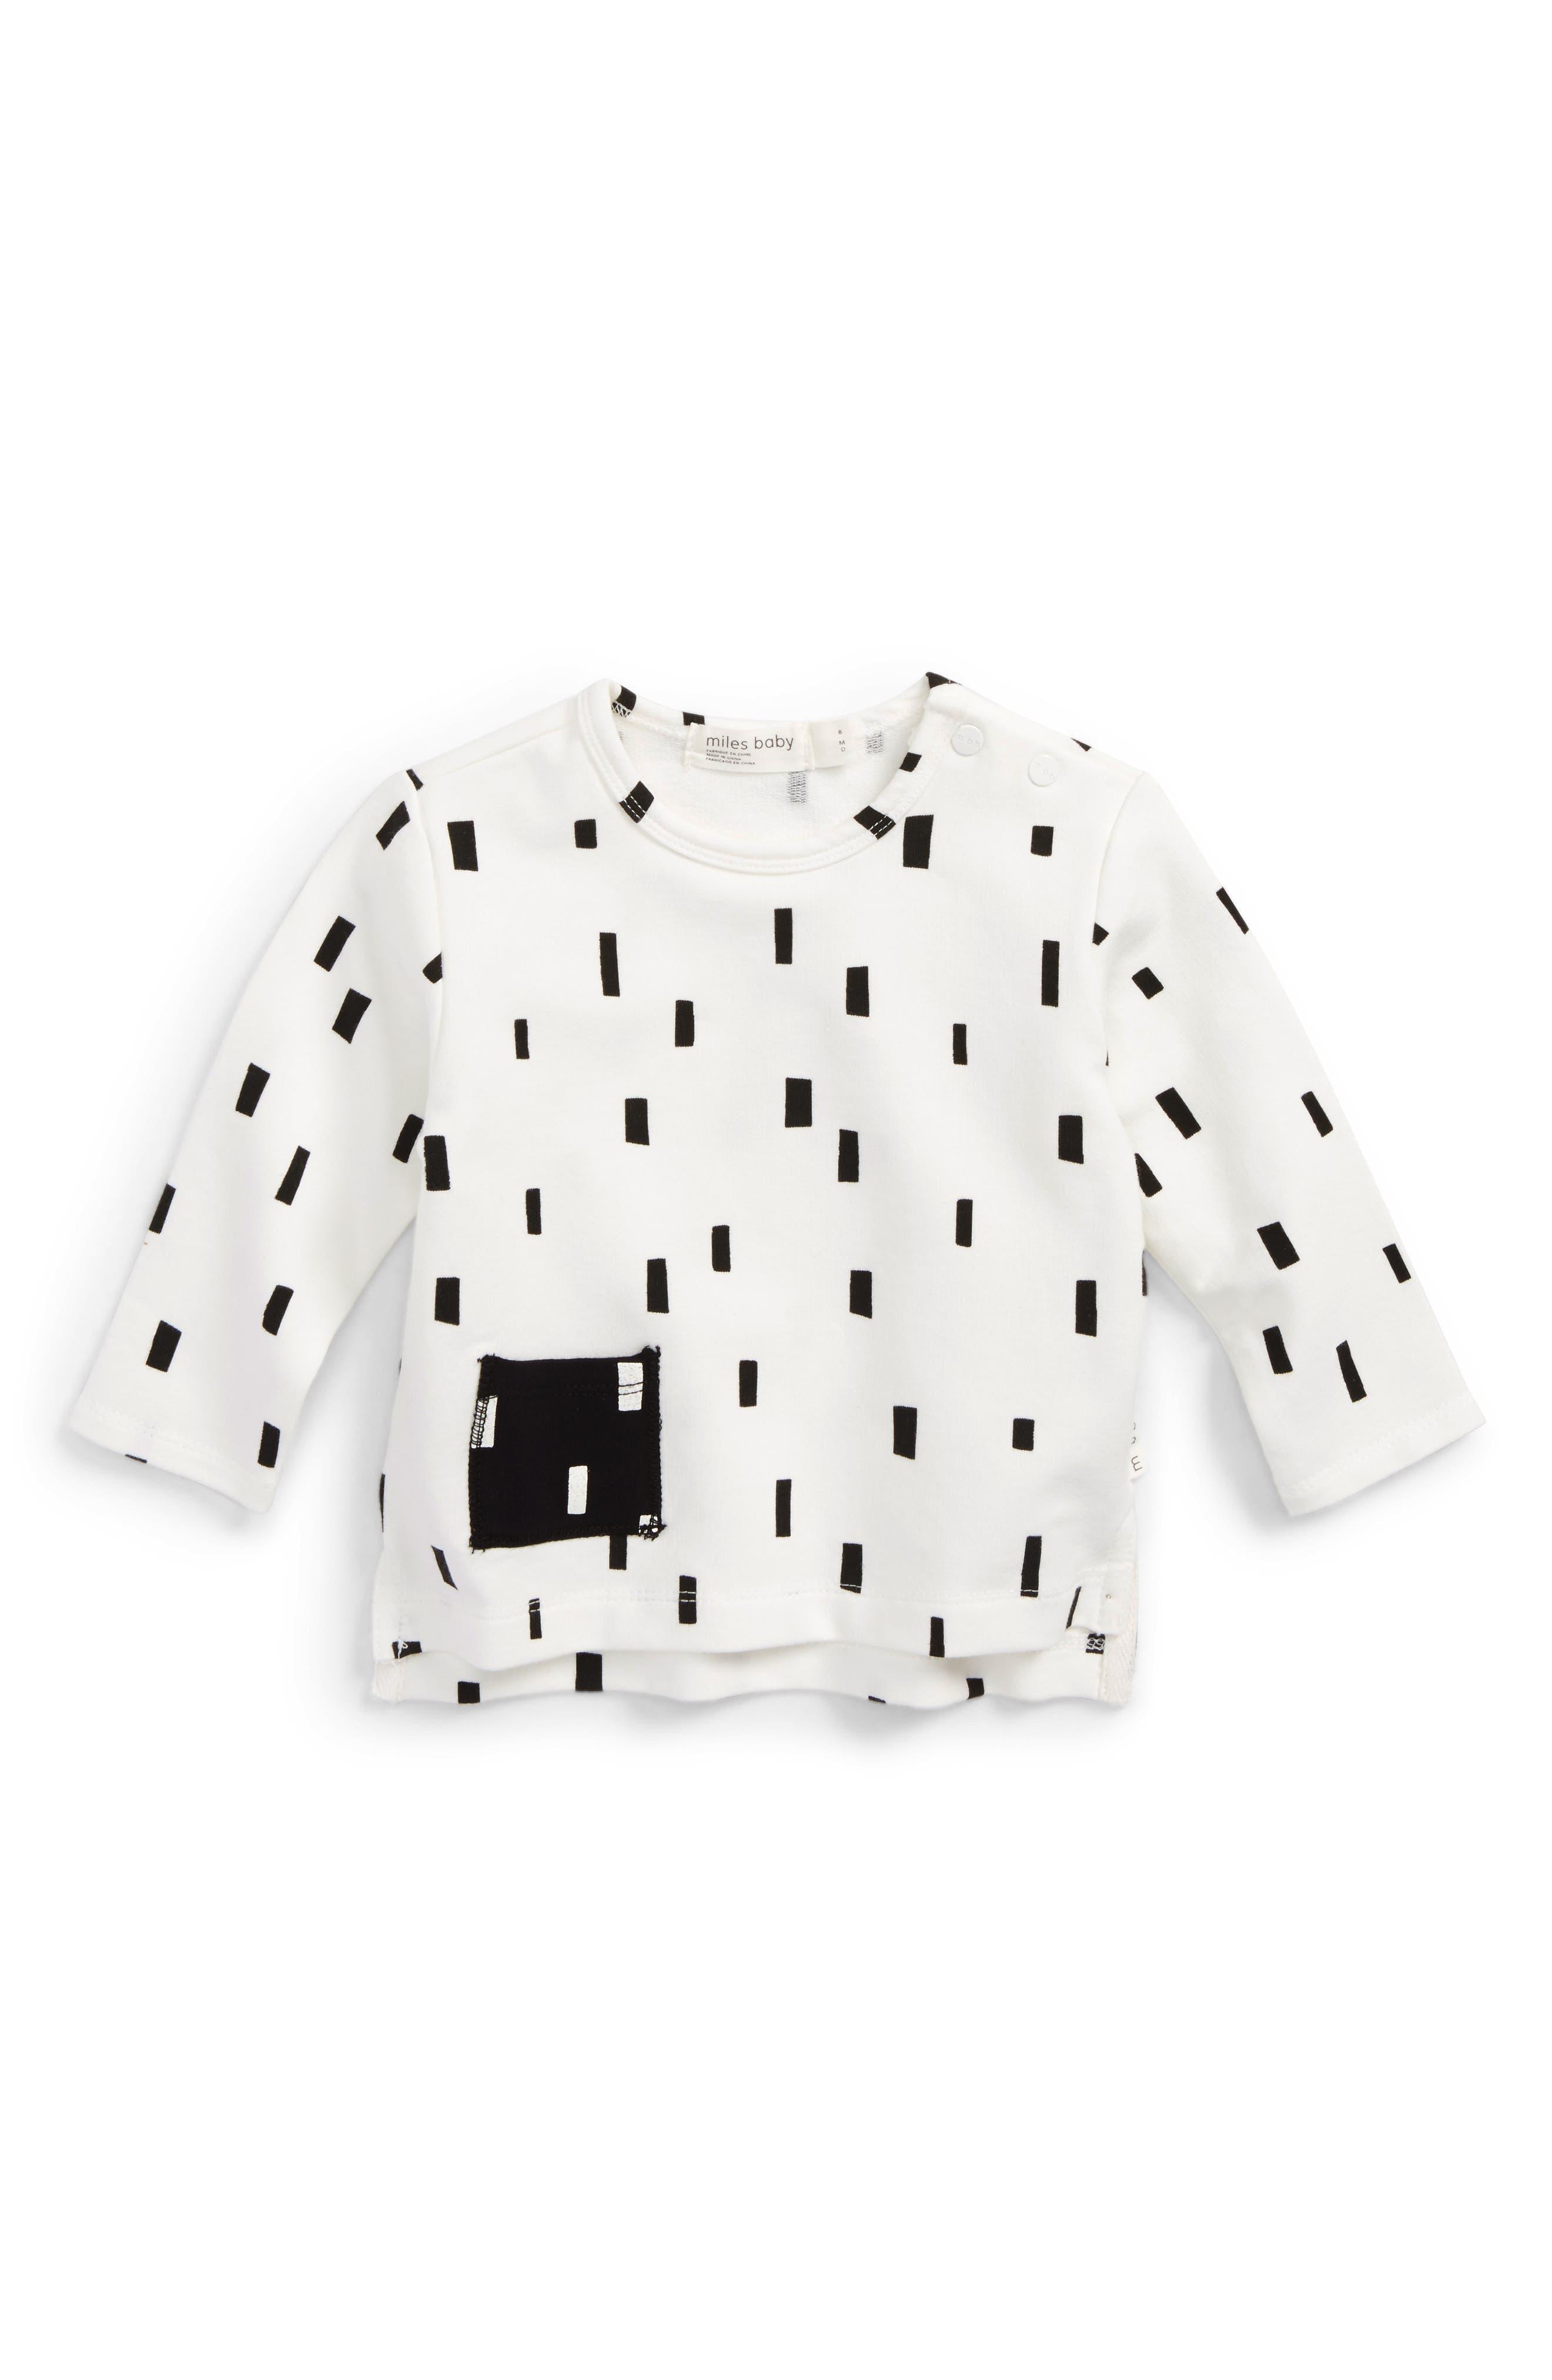 Miles Baby Pocket T-Shirt (Baby)